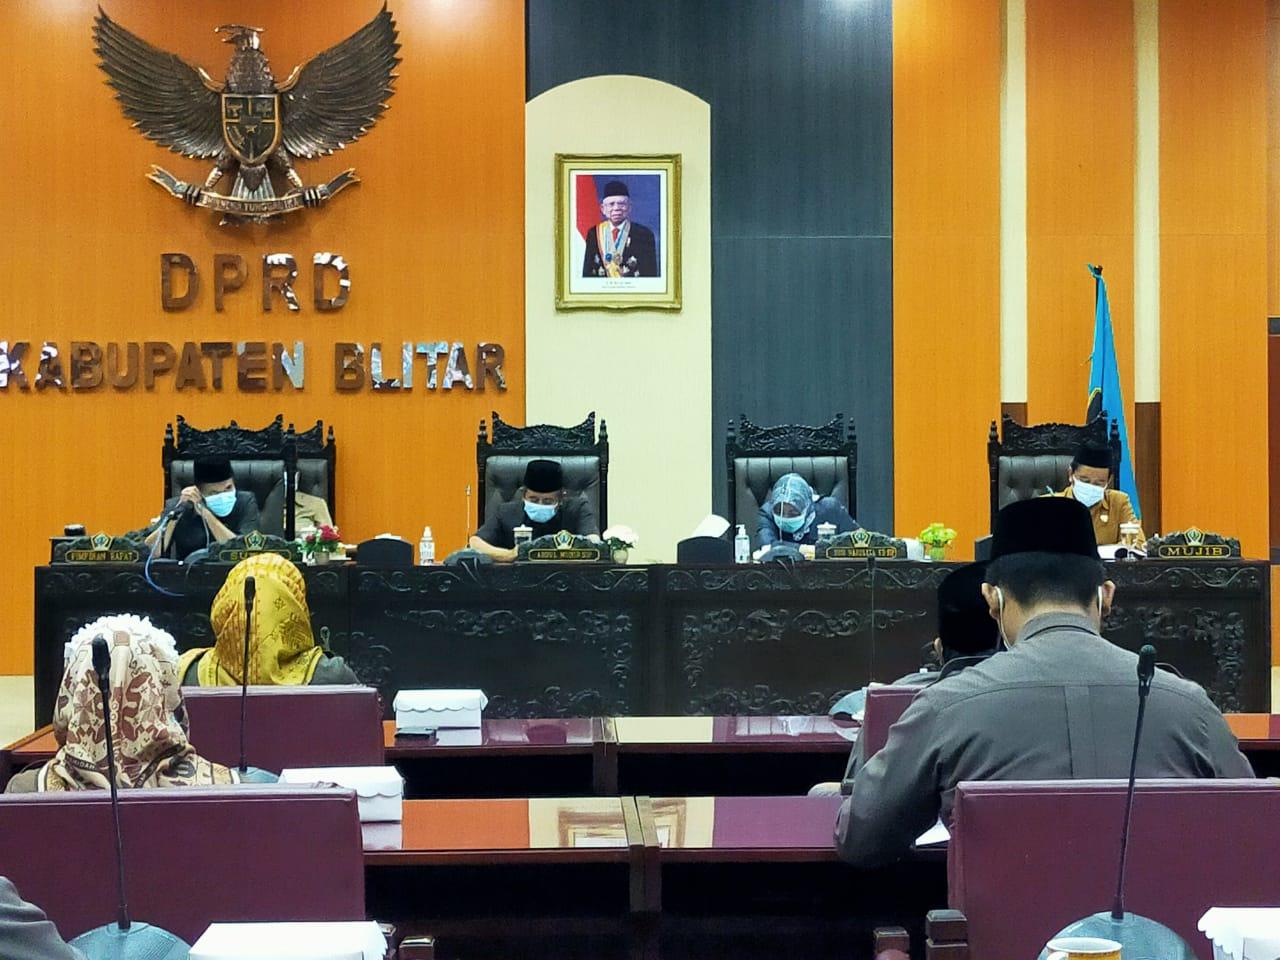 Rapat Paripurna DPRD Kabupaten Blitar Jatim (Robby / Mattanews.co)